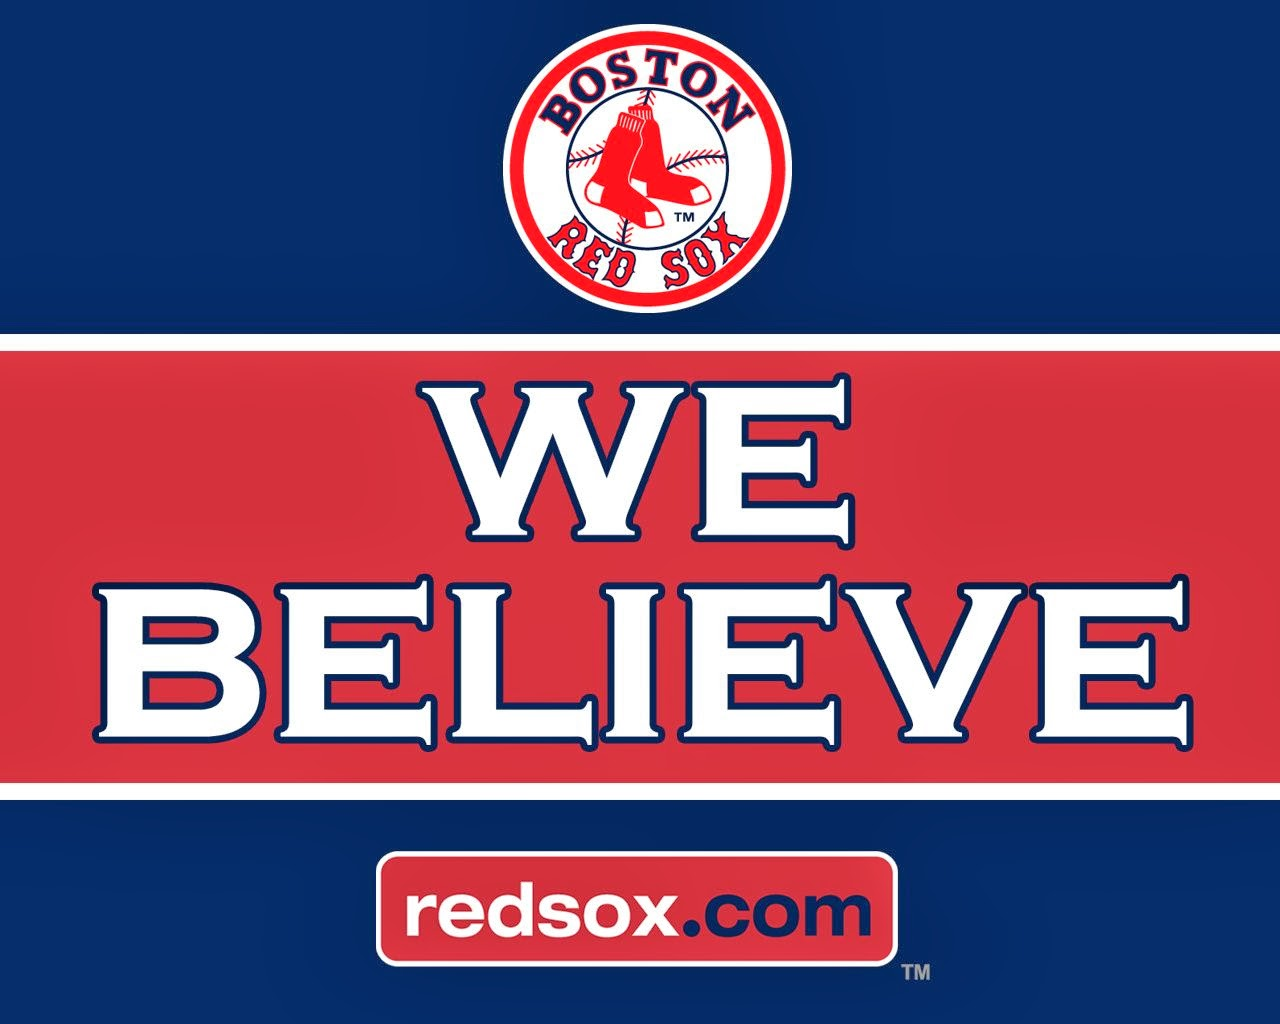 Boston Sports Wallpapers: [49+] Boston Sports Teams Wallpaper On WallpaperSafari